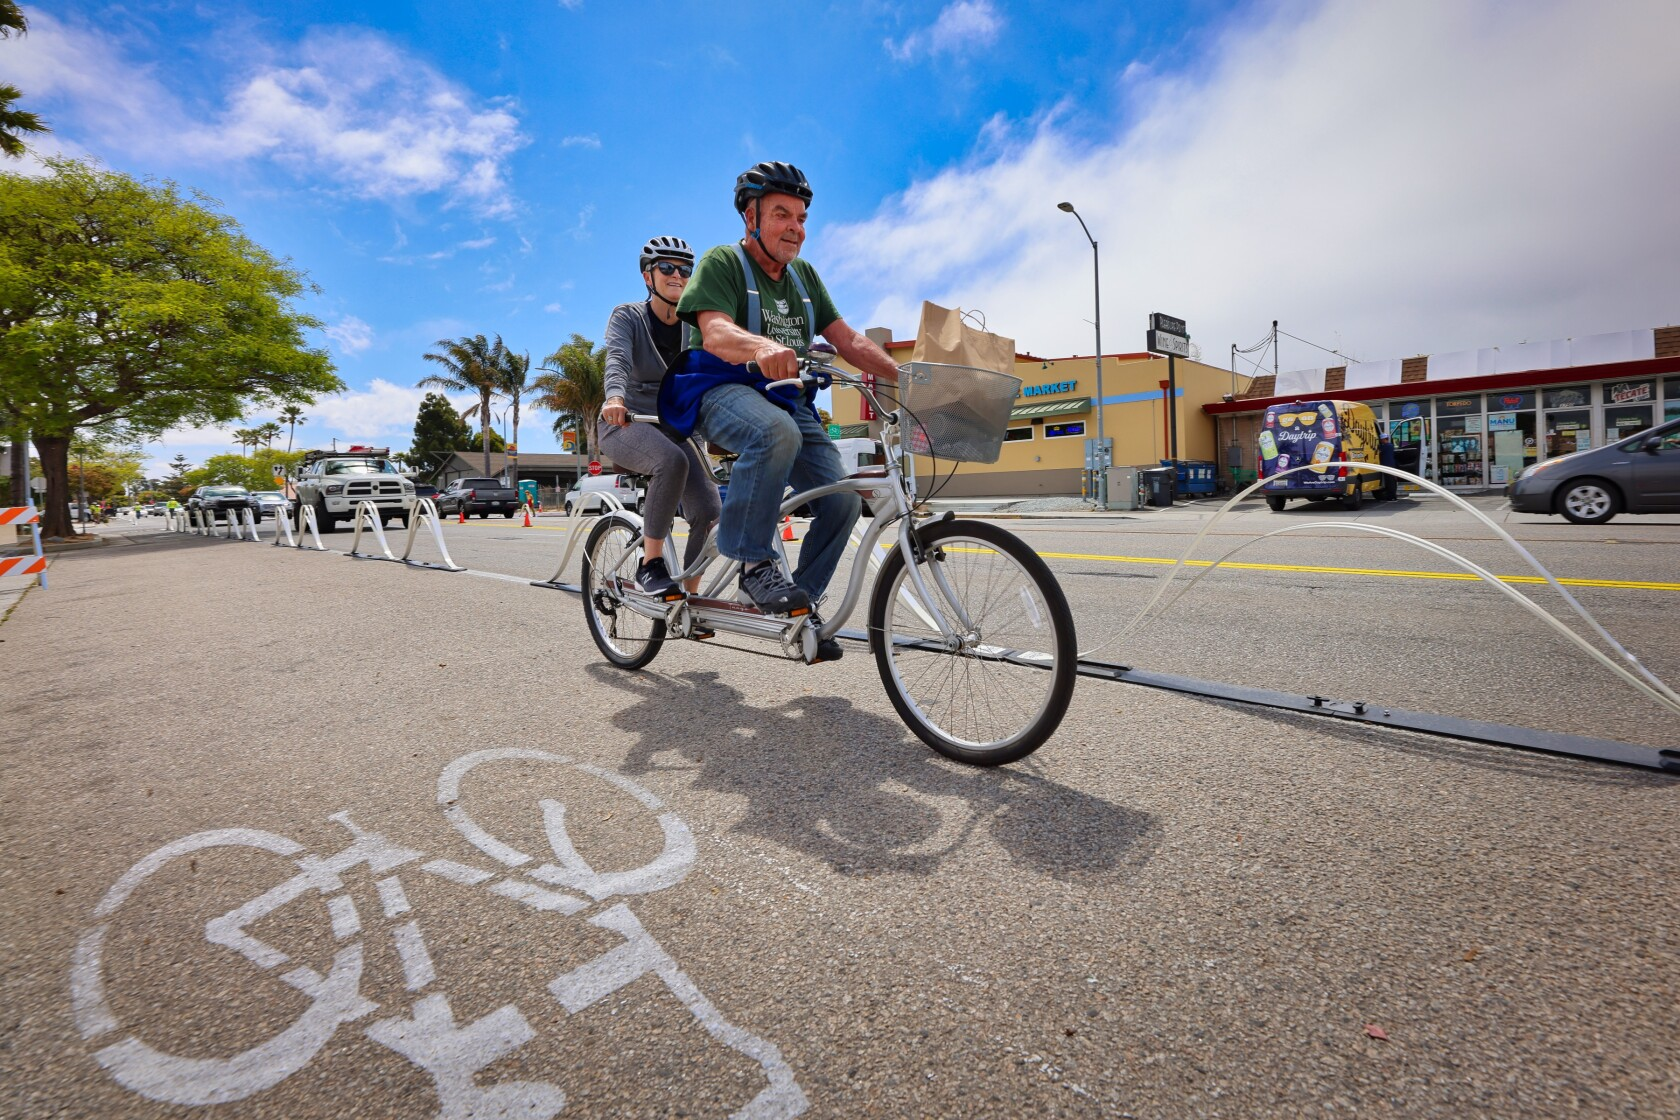 A couple takes advantage of the newly protected bike lane on Portola Drive on Tuesday.